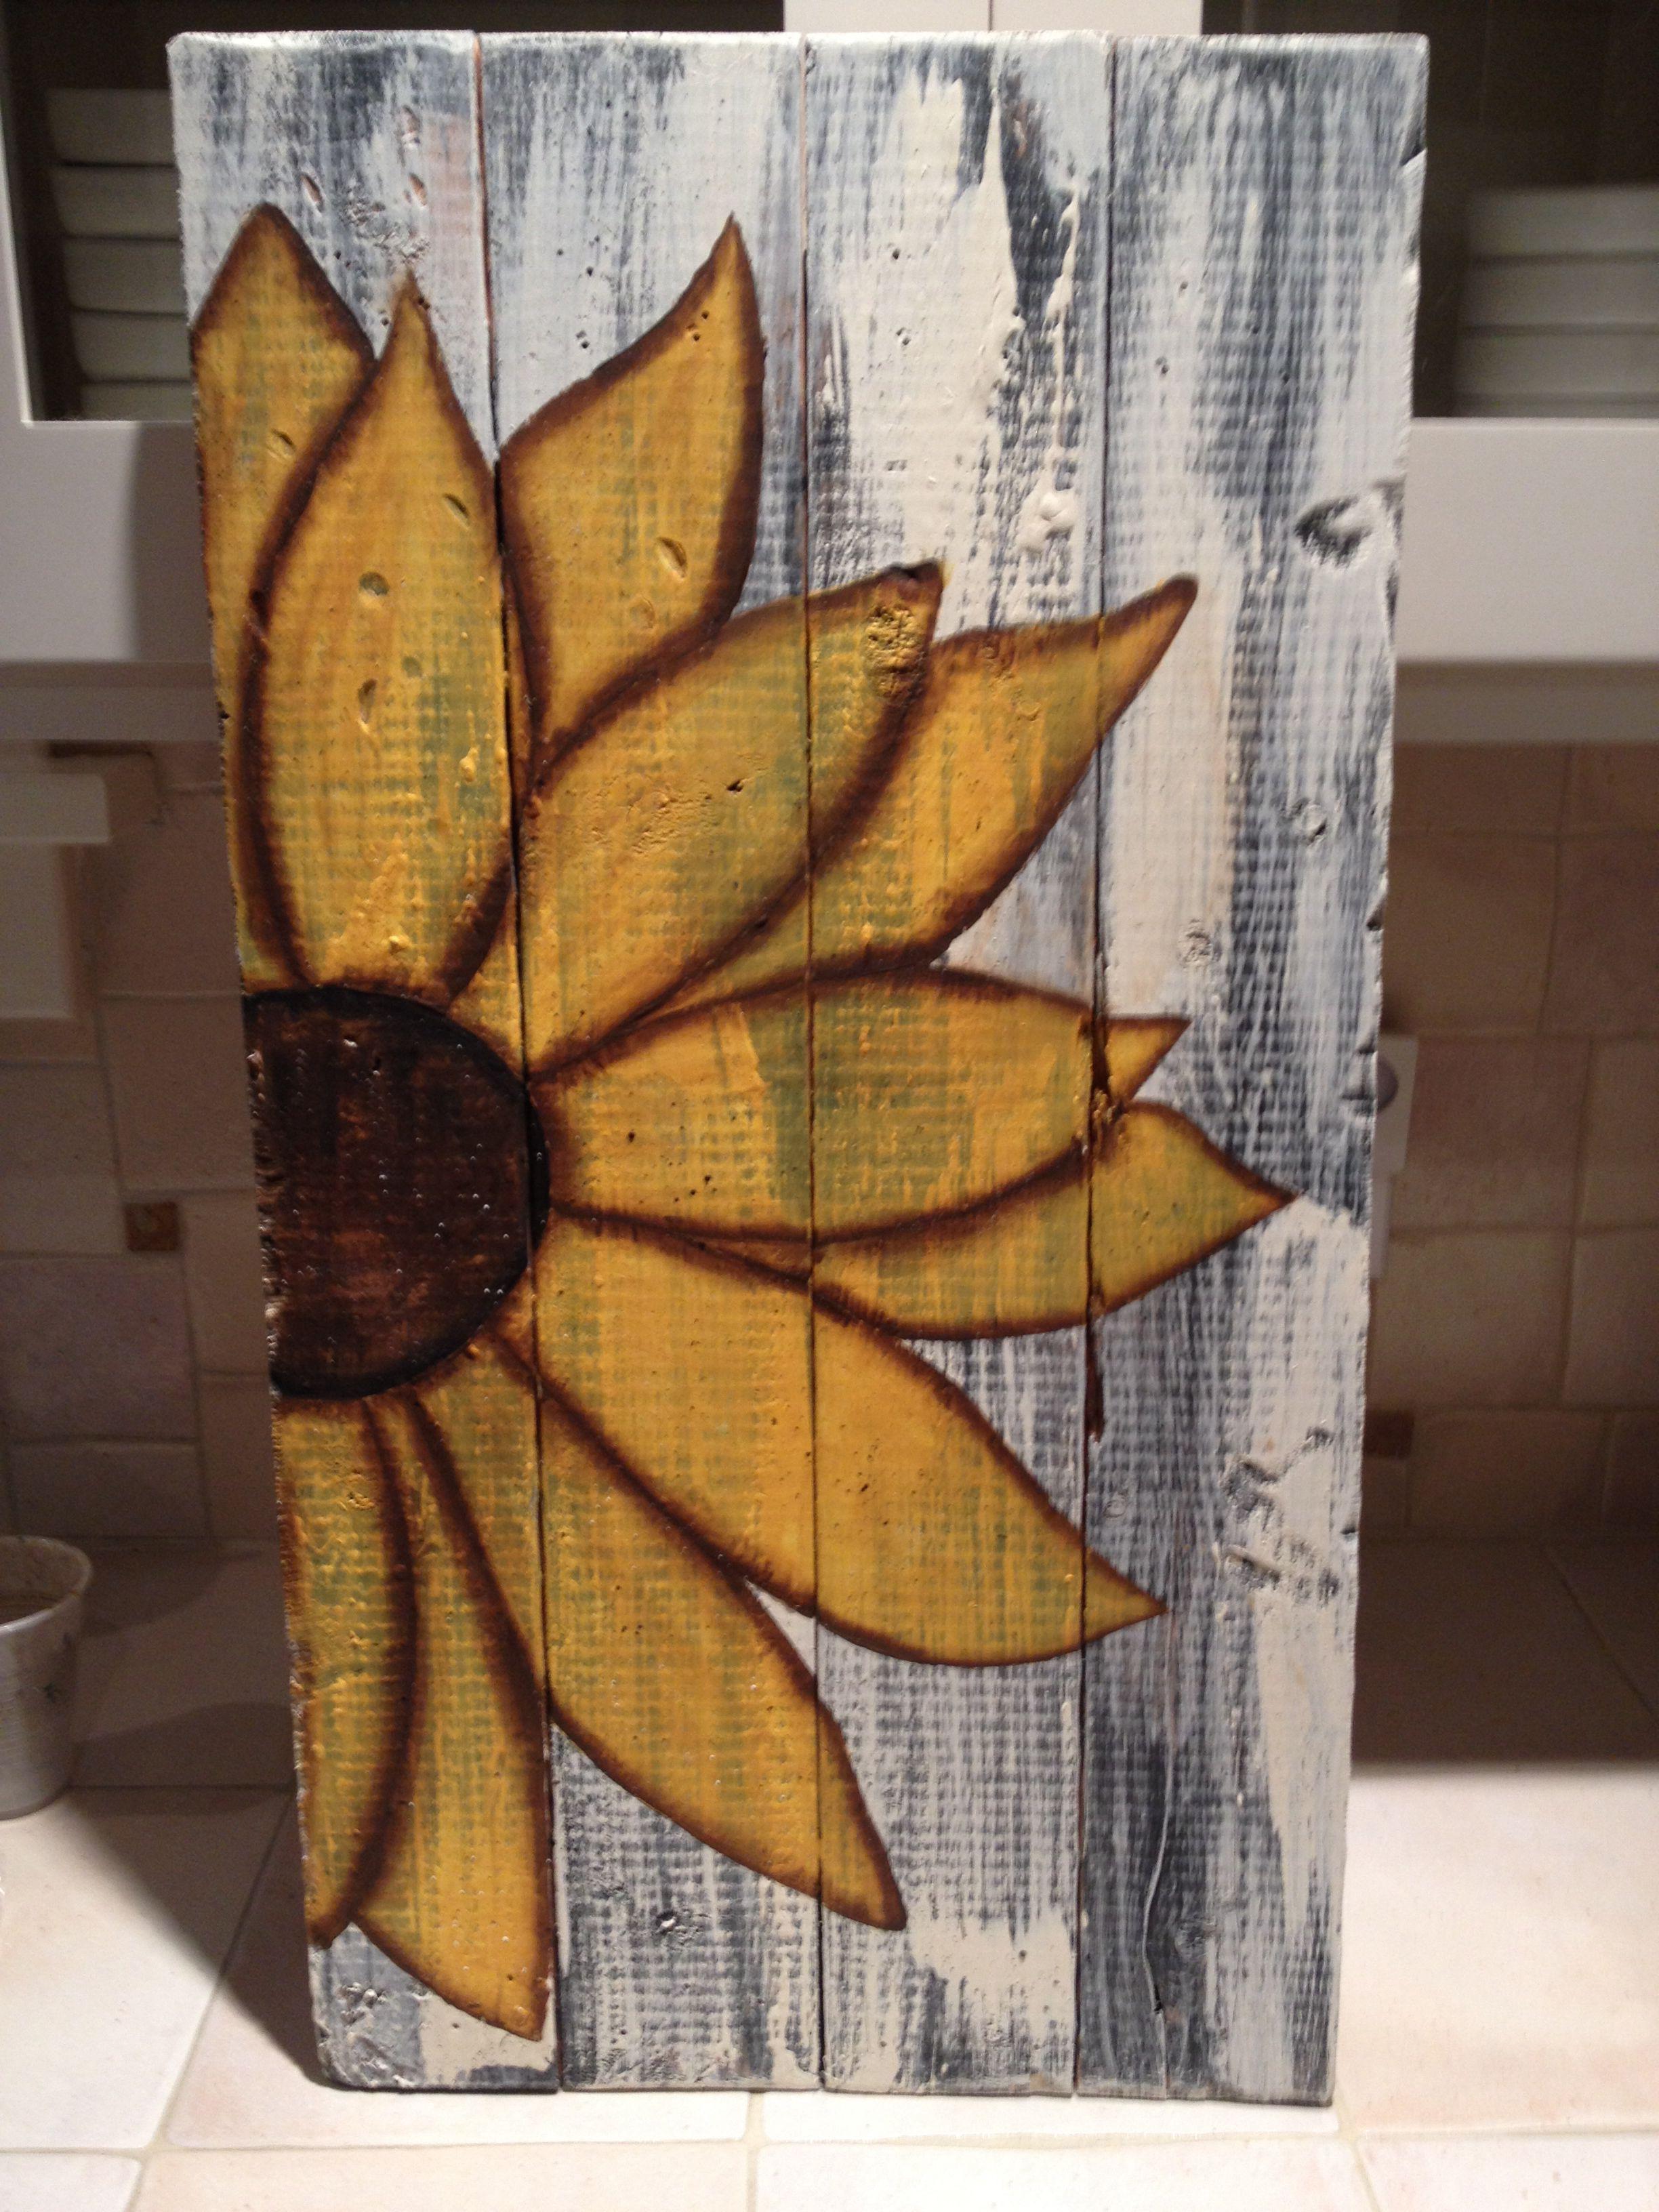 Pallet Art Sunflower Pallet Sign Pallets Pinterest Pallets And Sunflowers